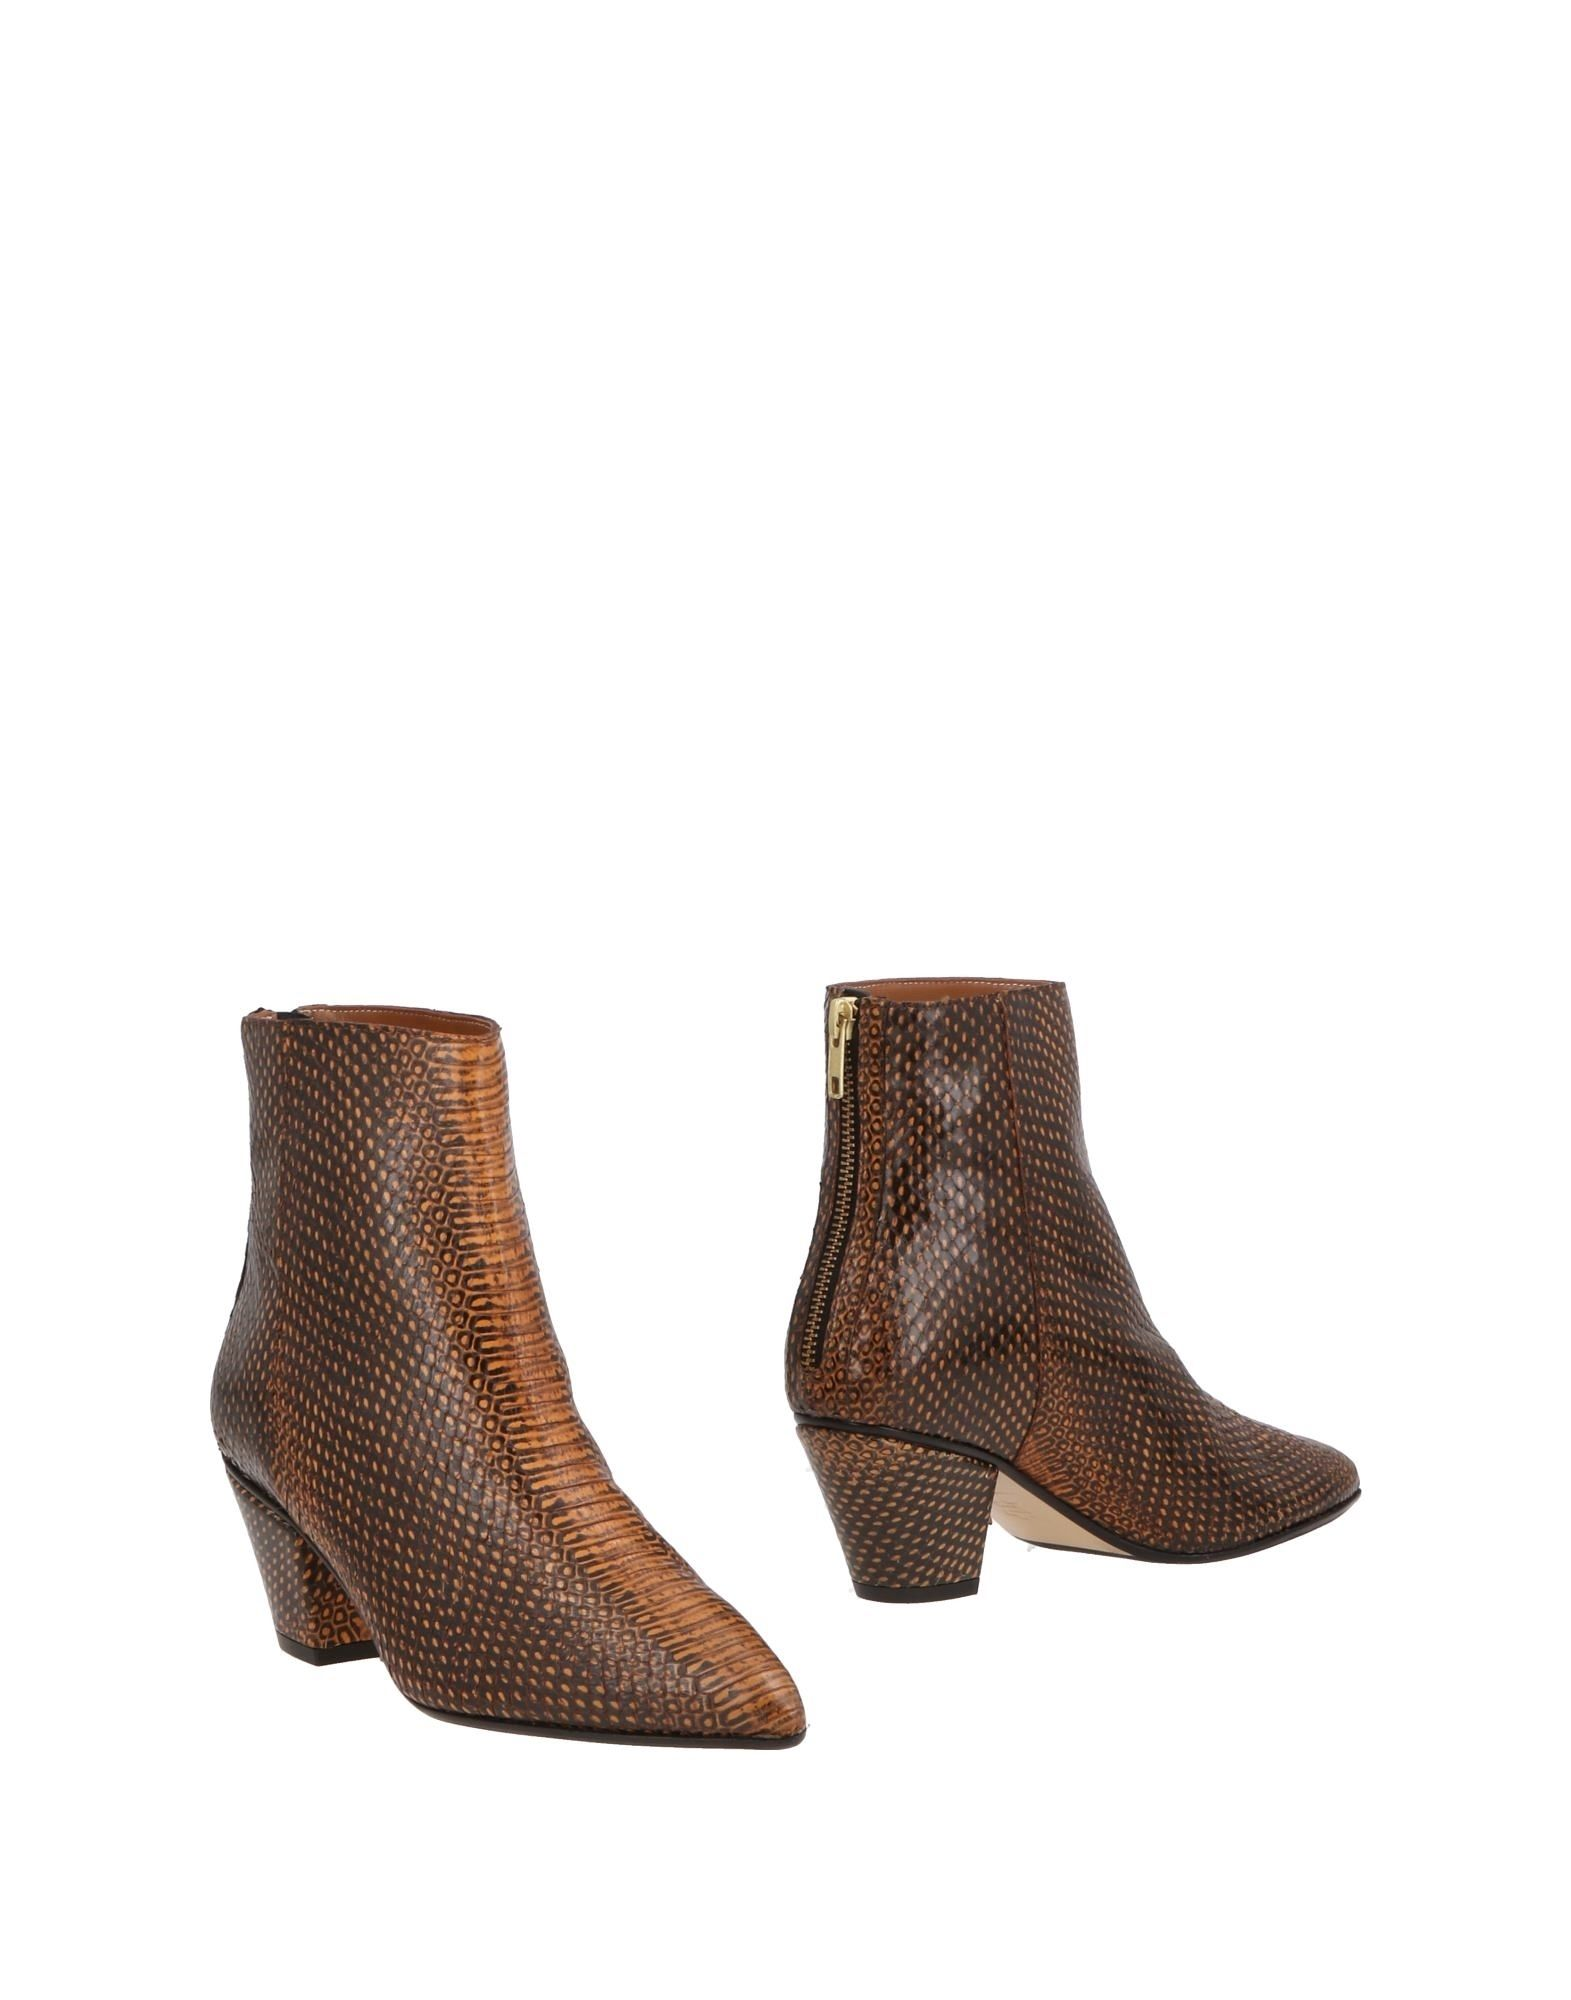 Rabatt Schuhe Atp Damen Atelier Stiefelette Damen Atp  11496272NH 620c46